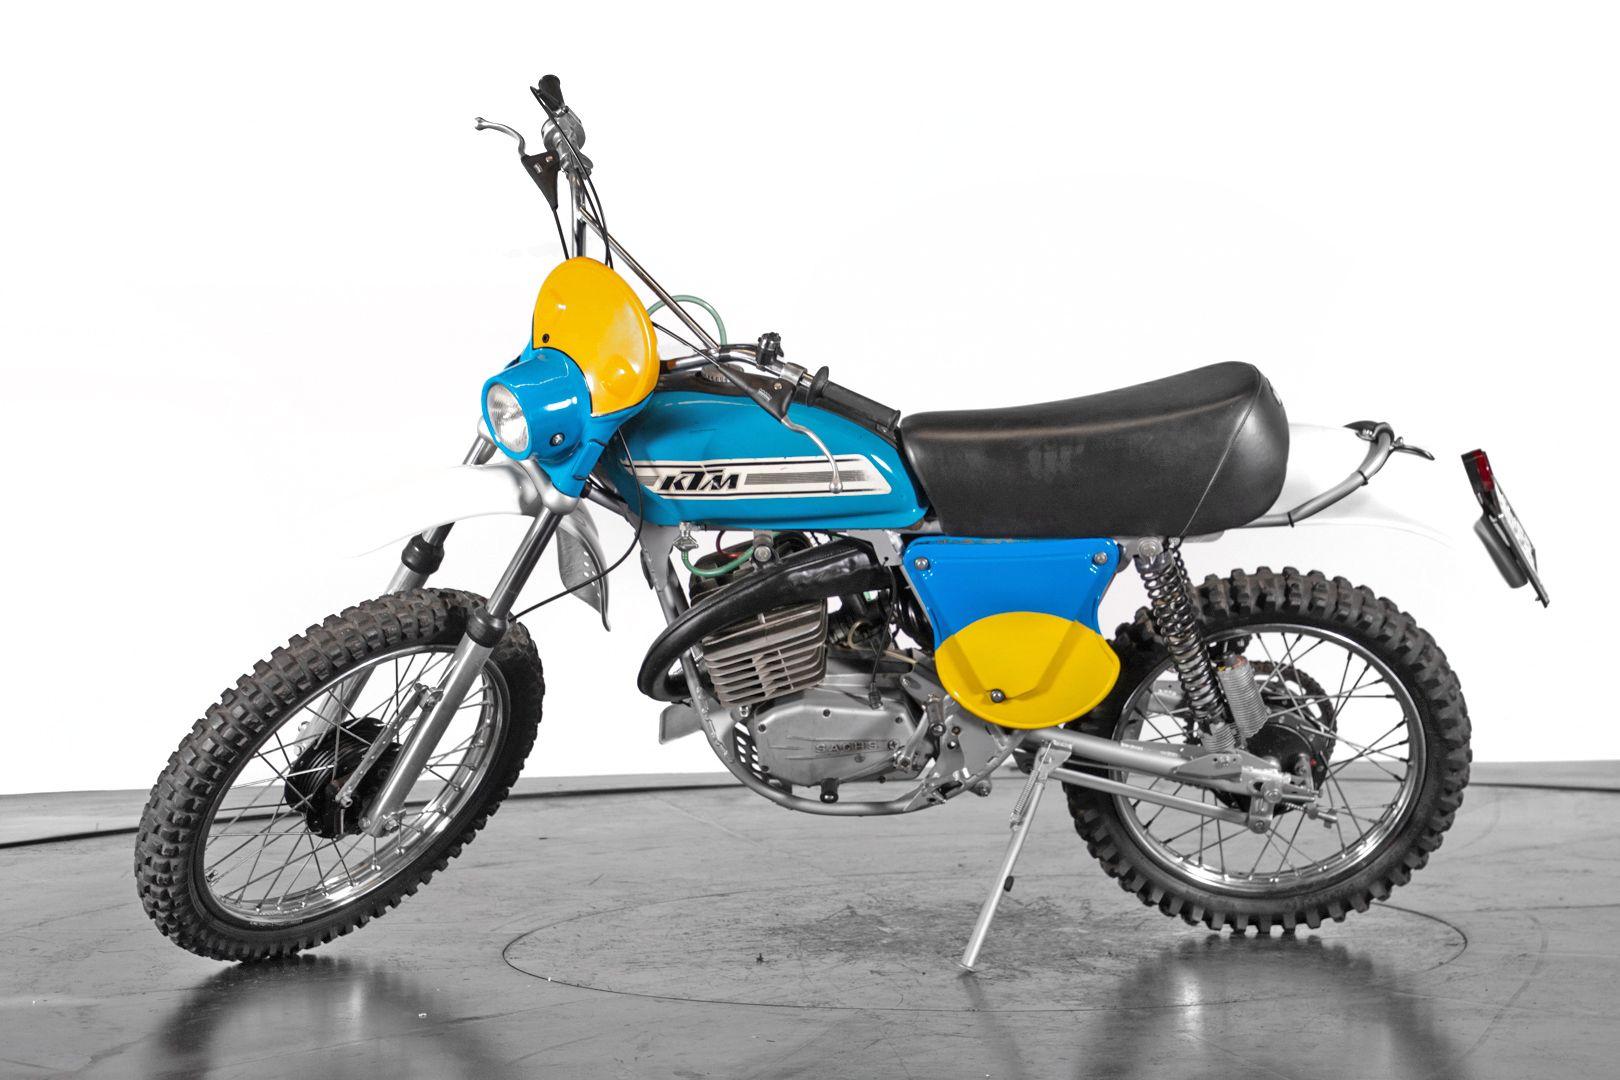 1975 KTM 125 50621